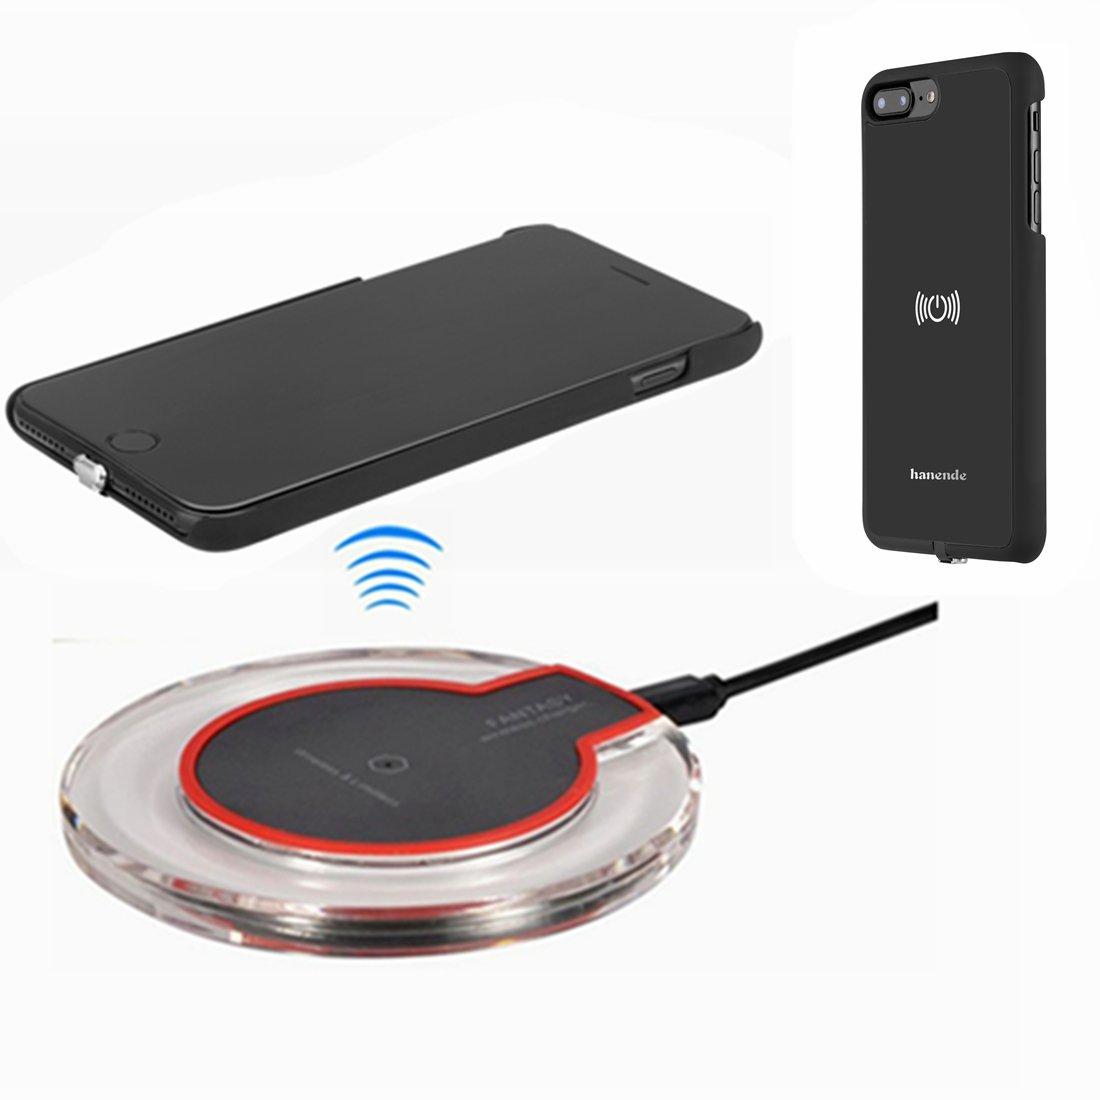 Kit de Cargador Inalámbrico para iPhone Plus hanende Qi carga inalámbrica Pad